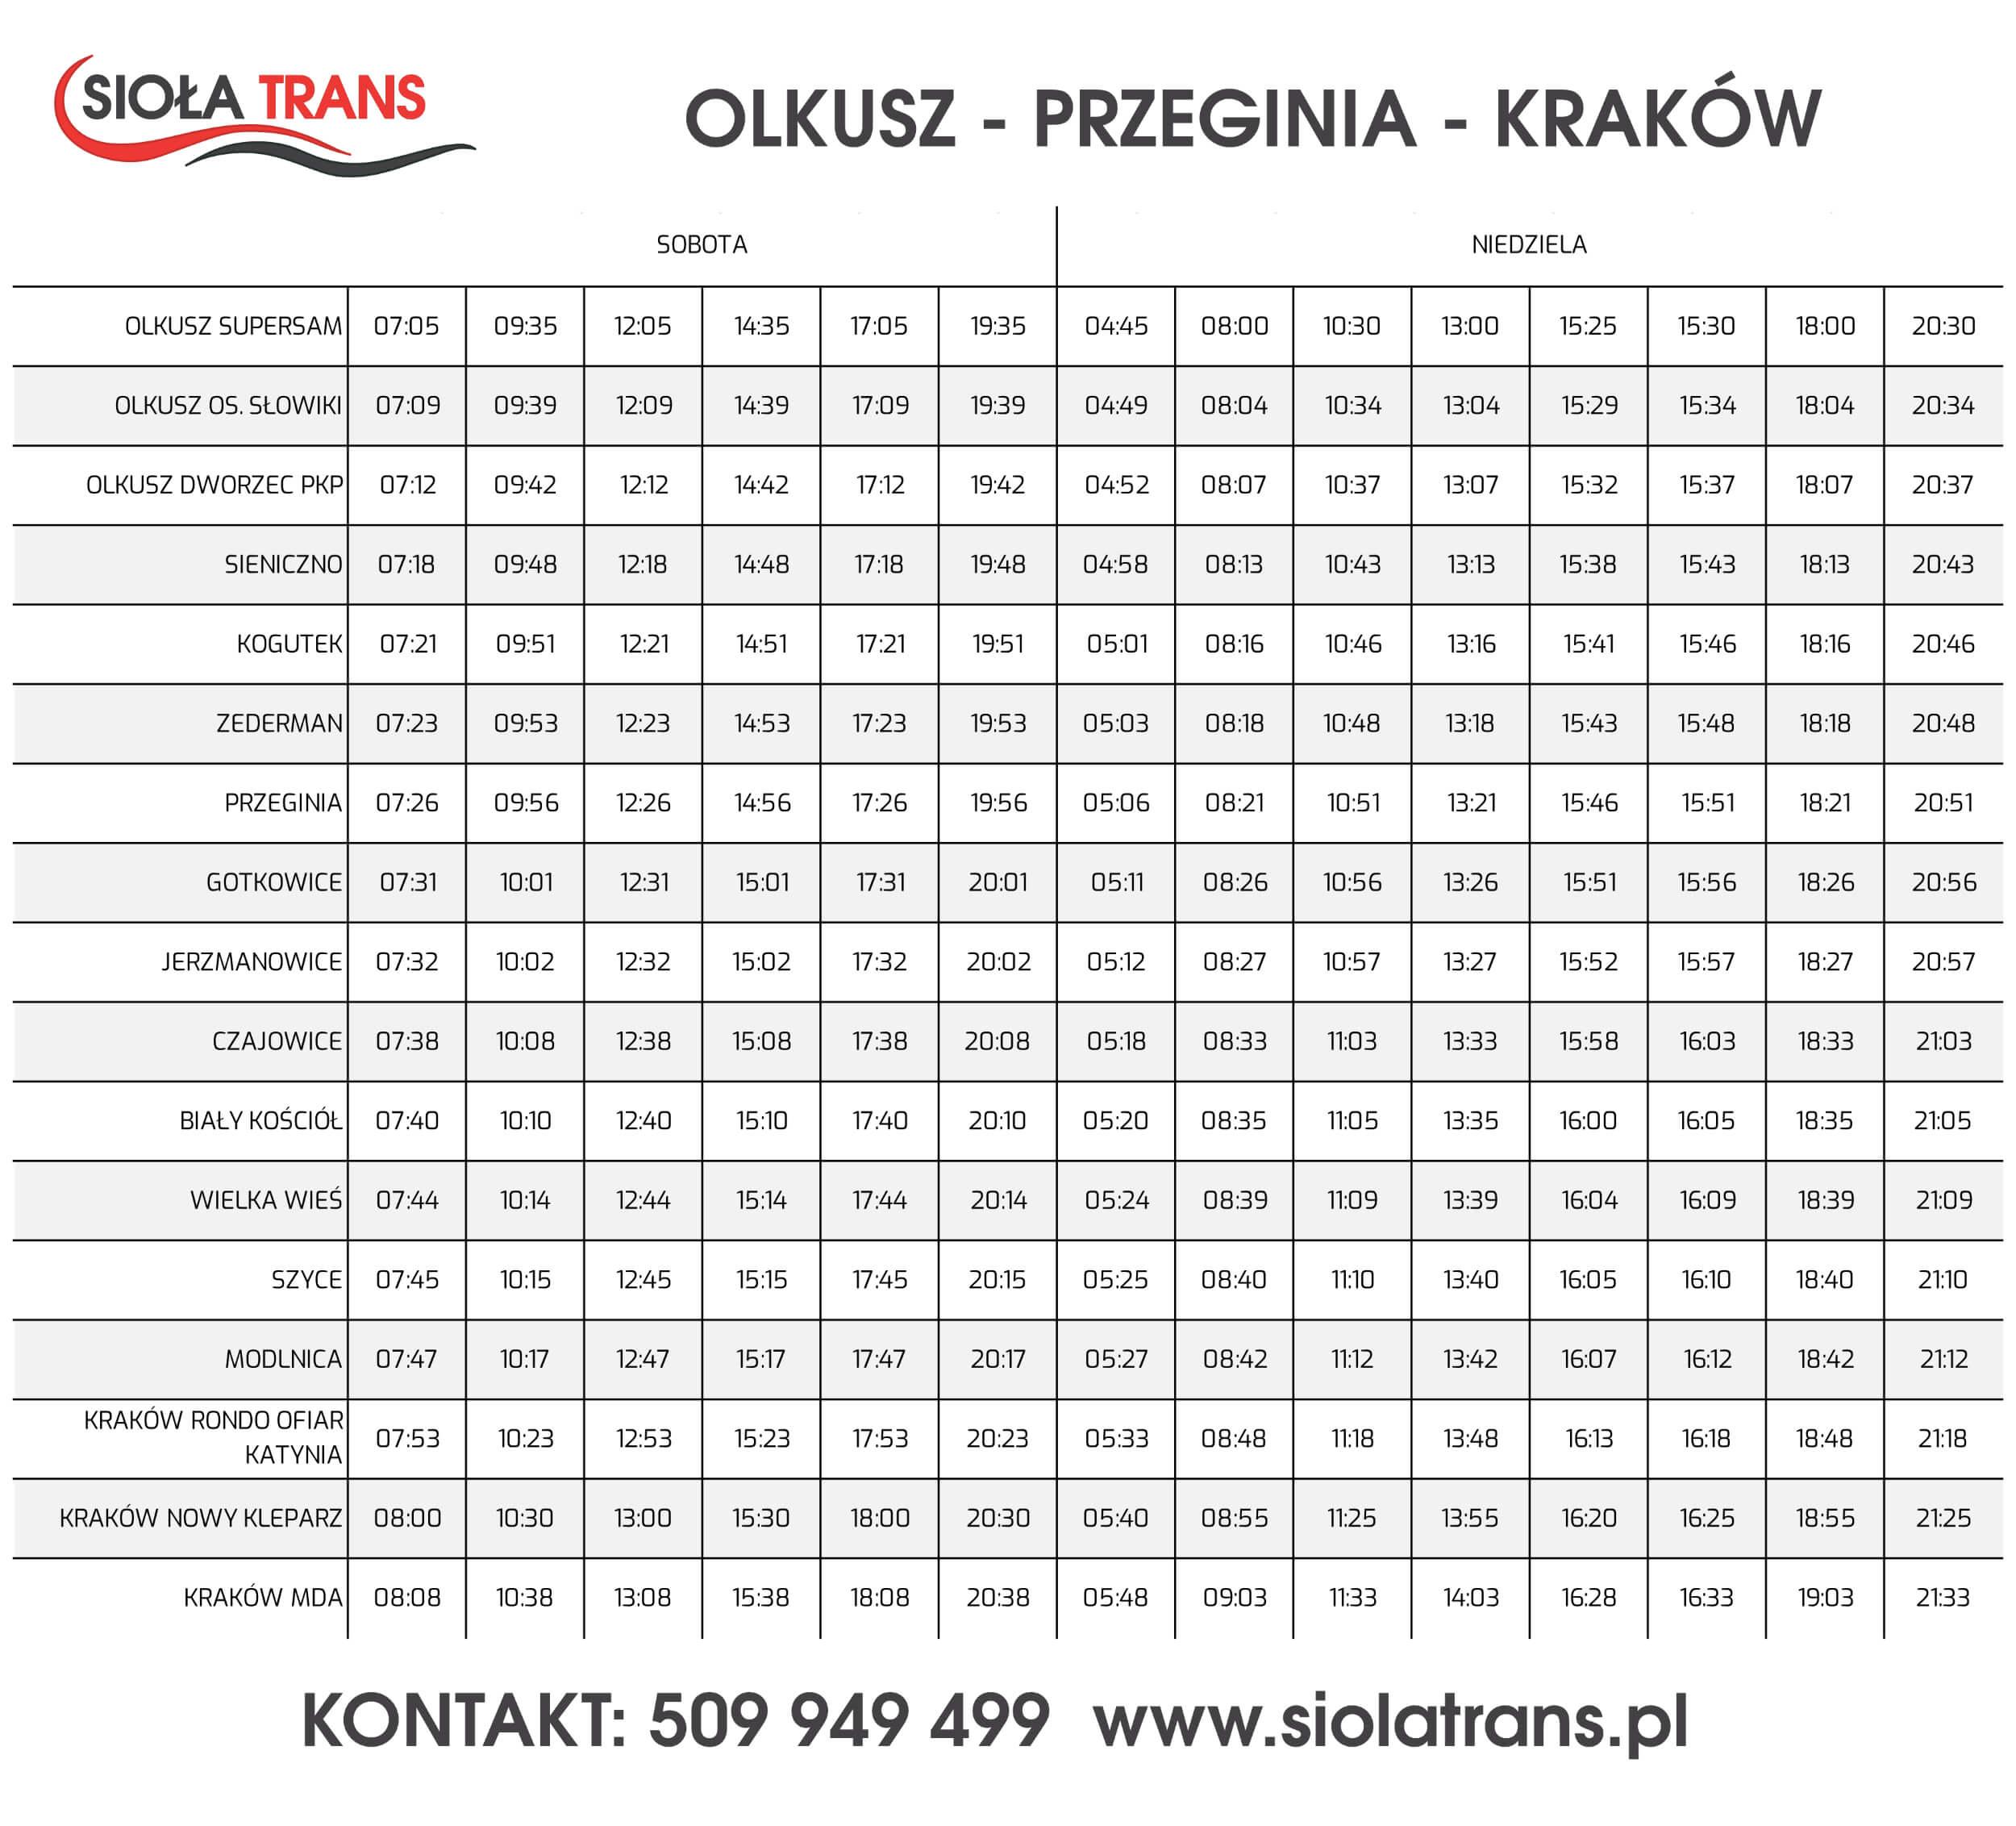 siola_trans_olkusz_krakow_wknd